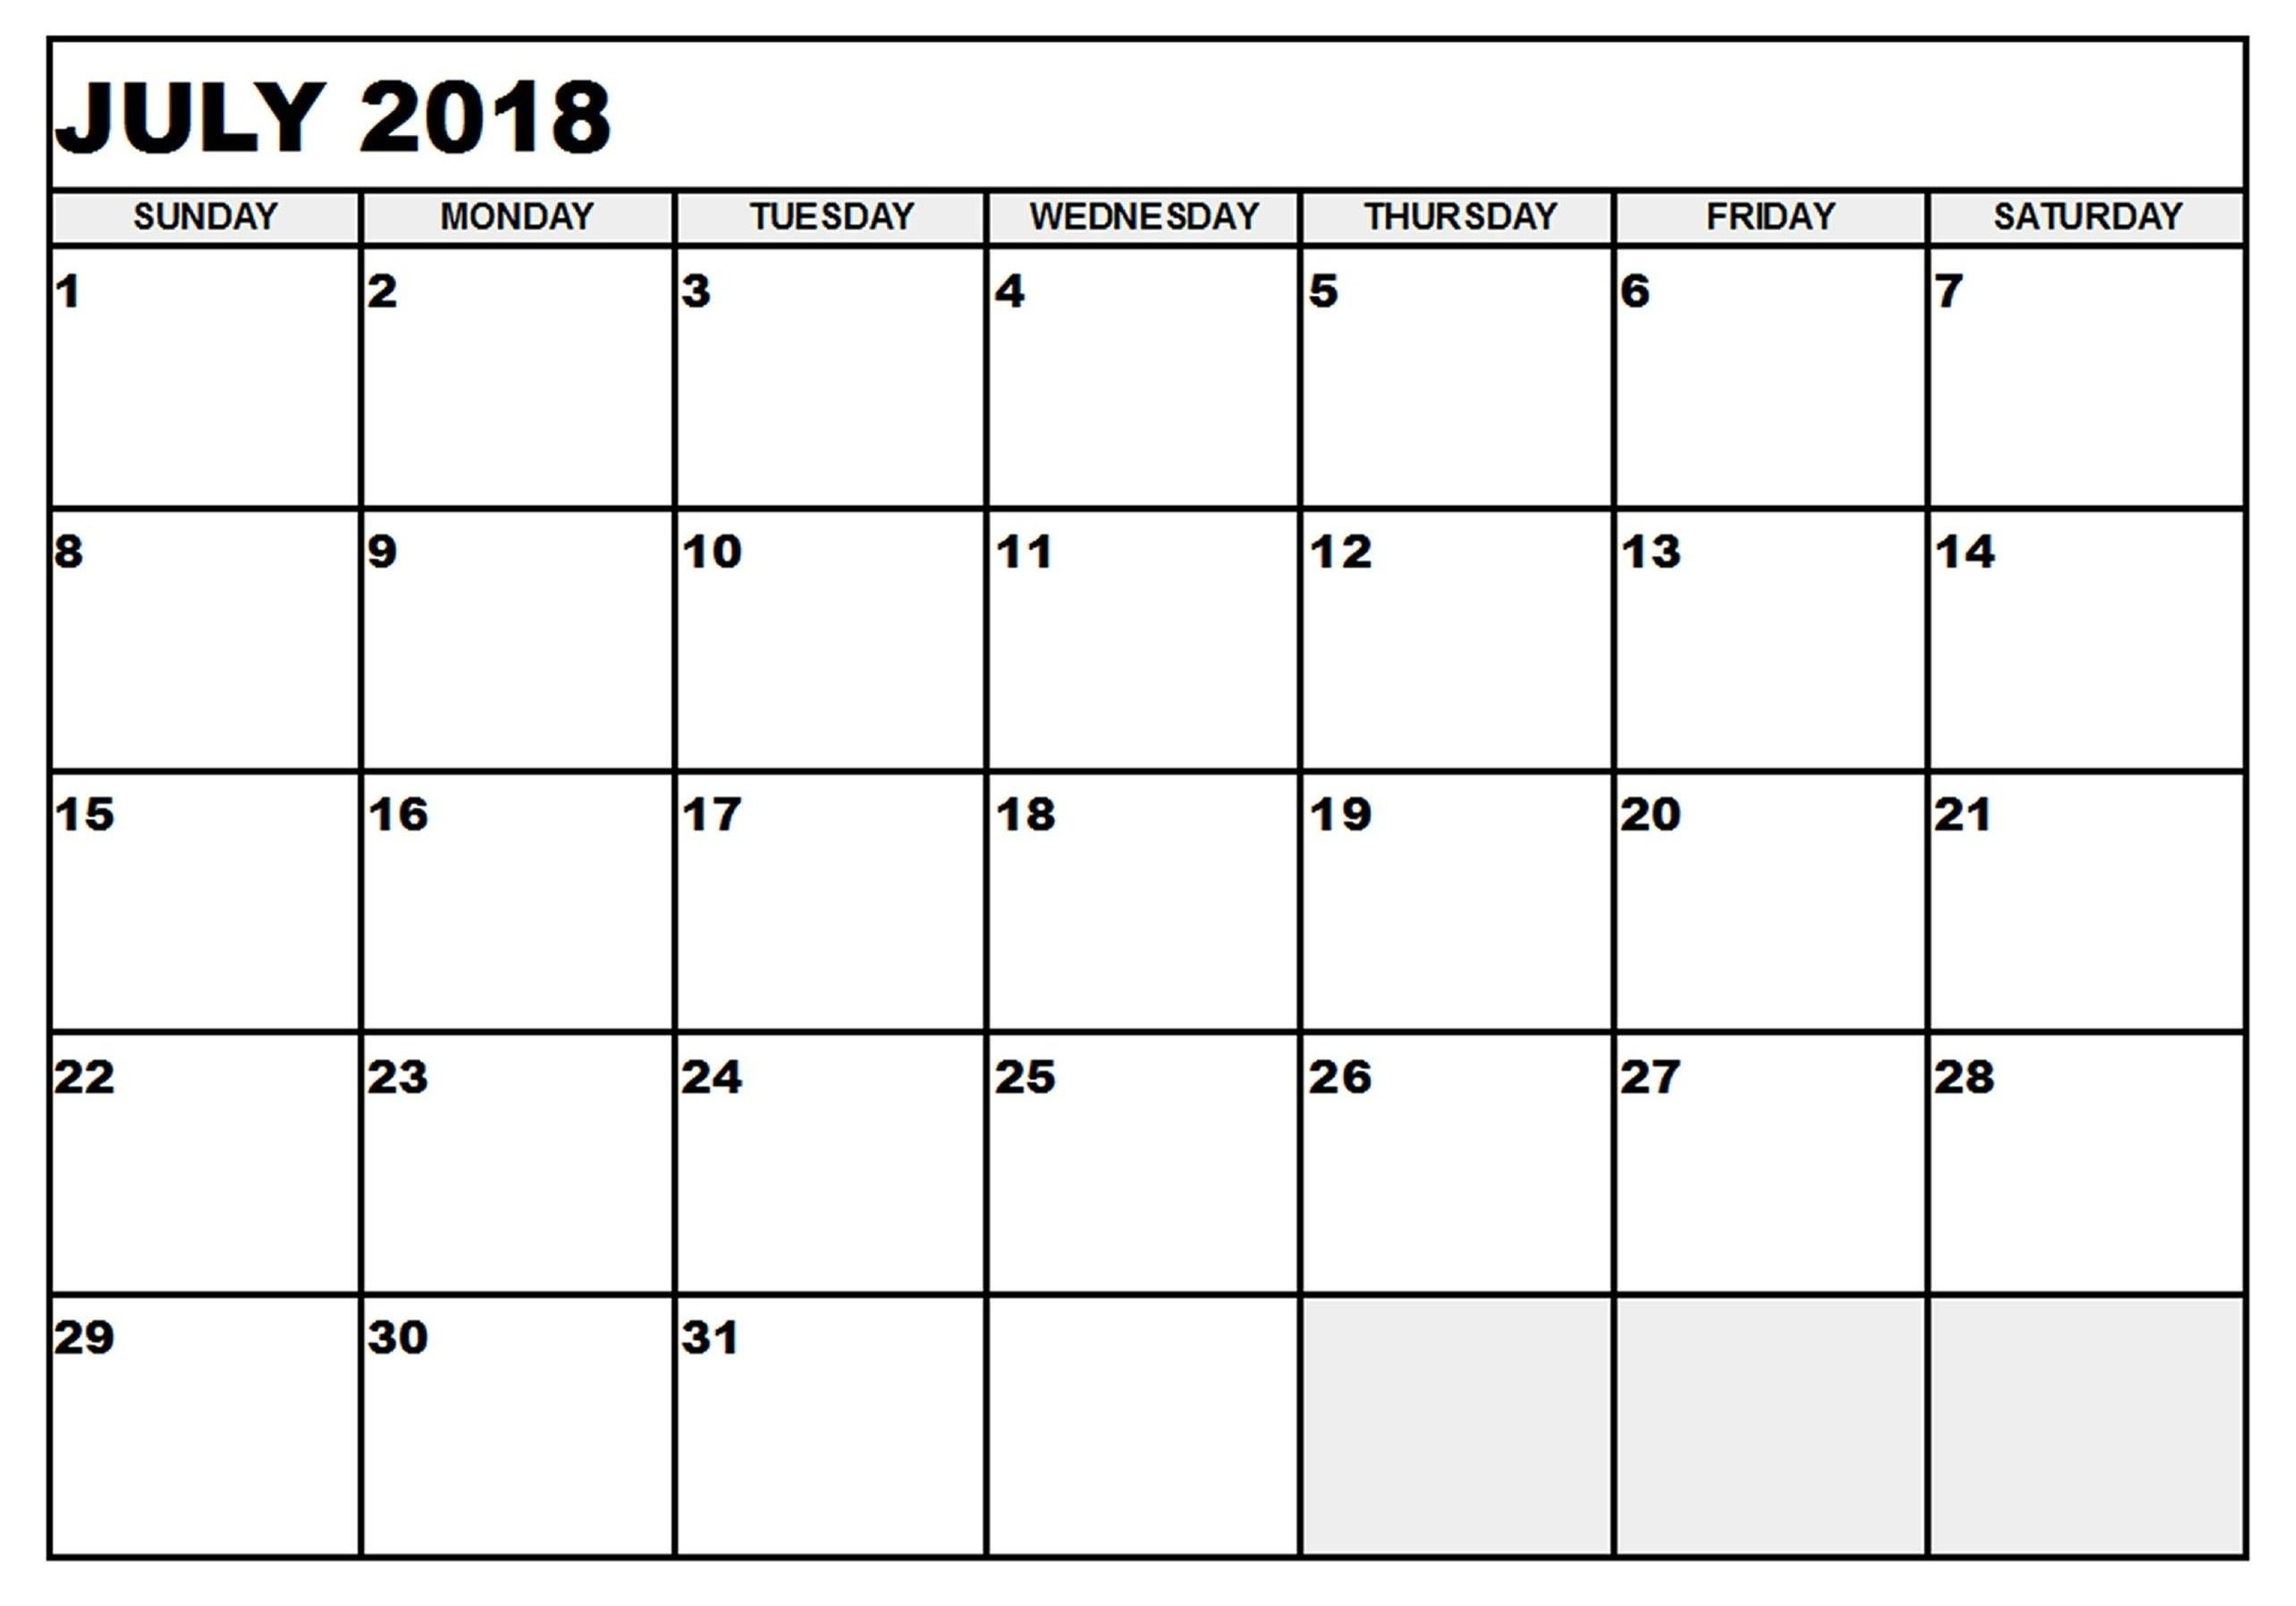 July 17 Calendar   Thekpark-Hadong_Blank Calendar July 17